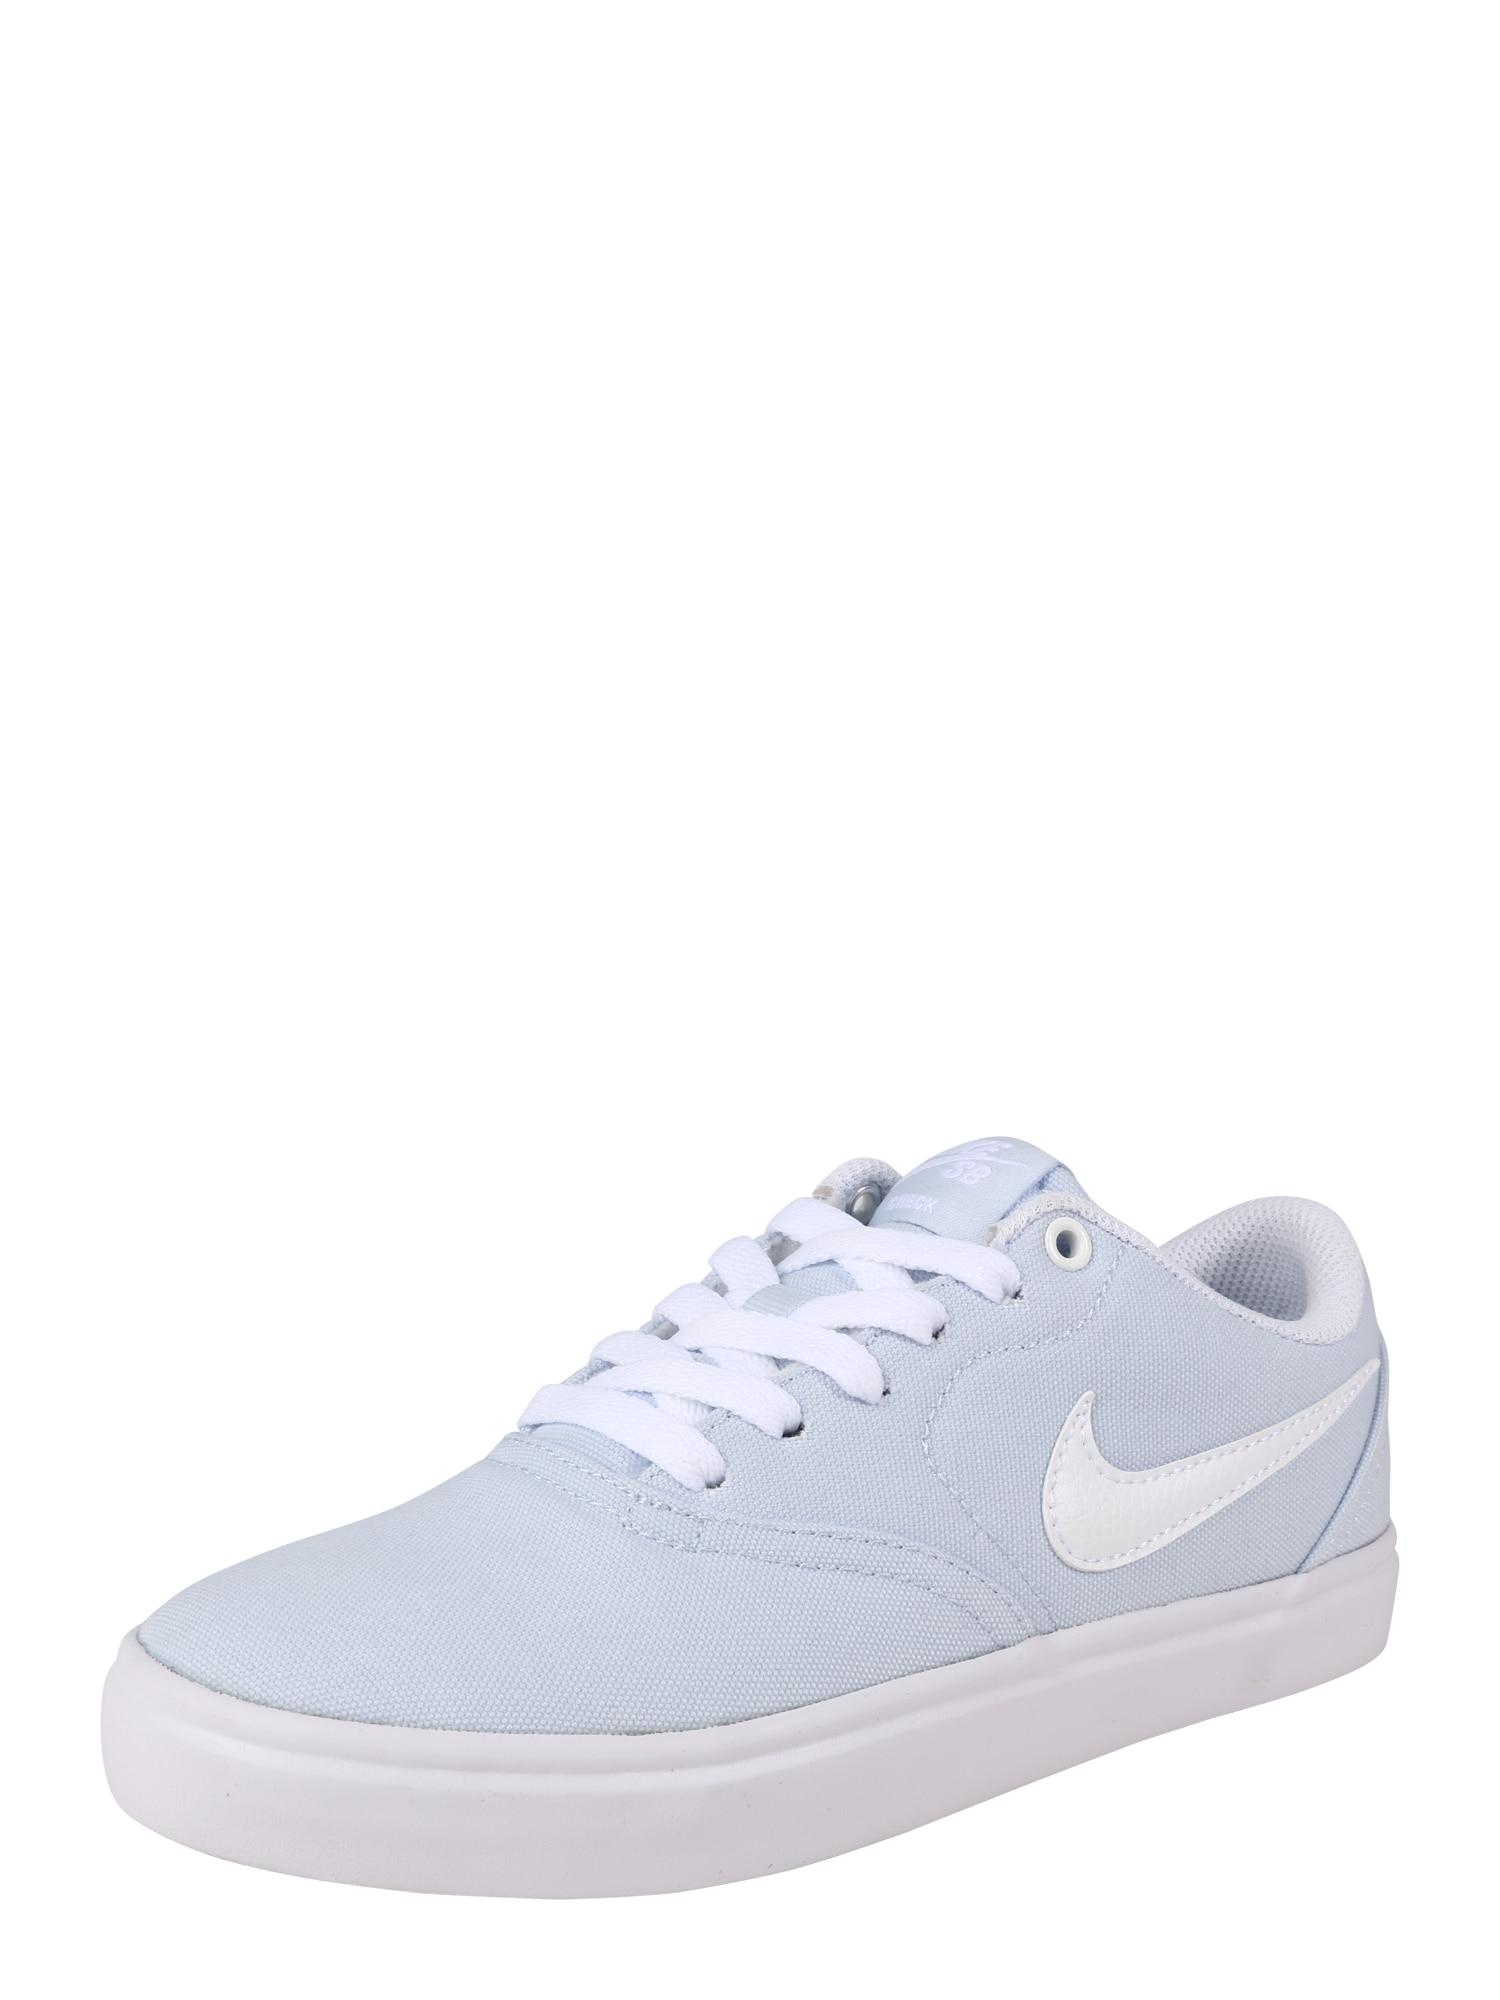 Sportovní boty Solarsoft Canvas blau weiß Nike SB